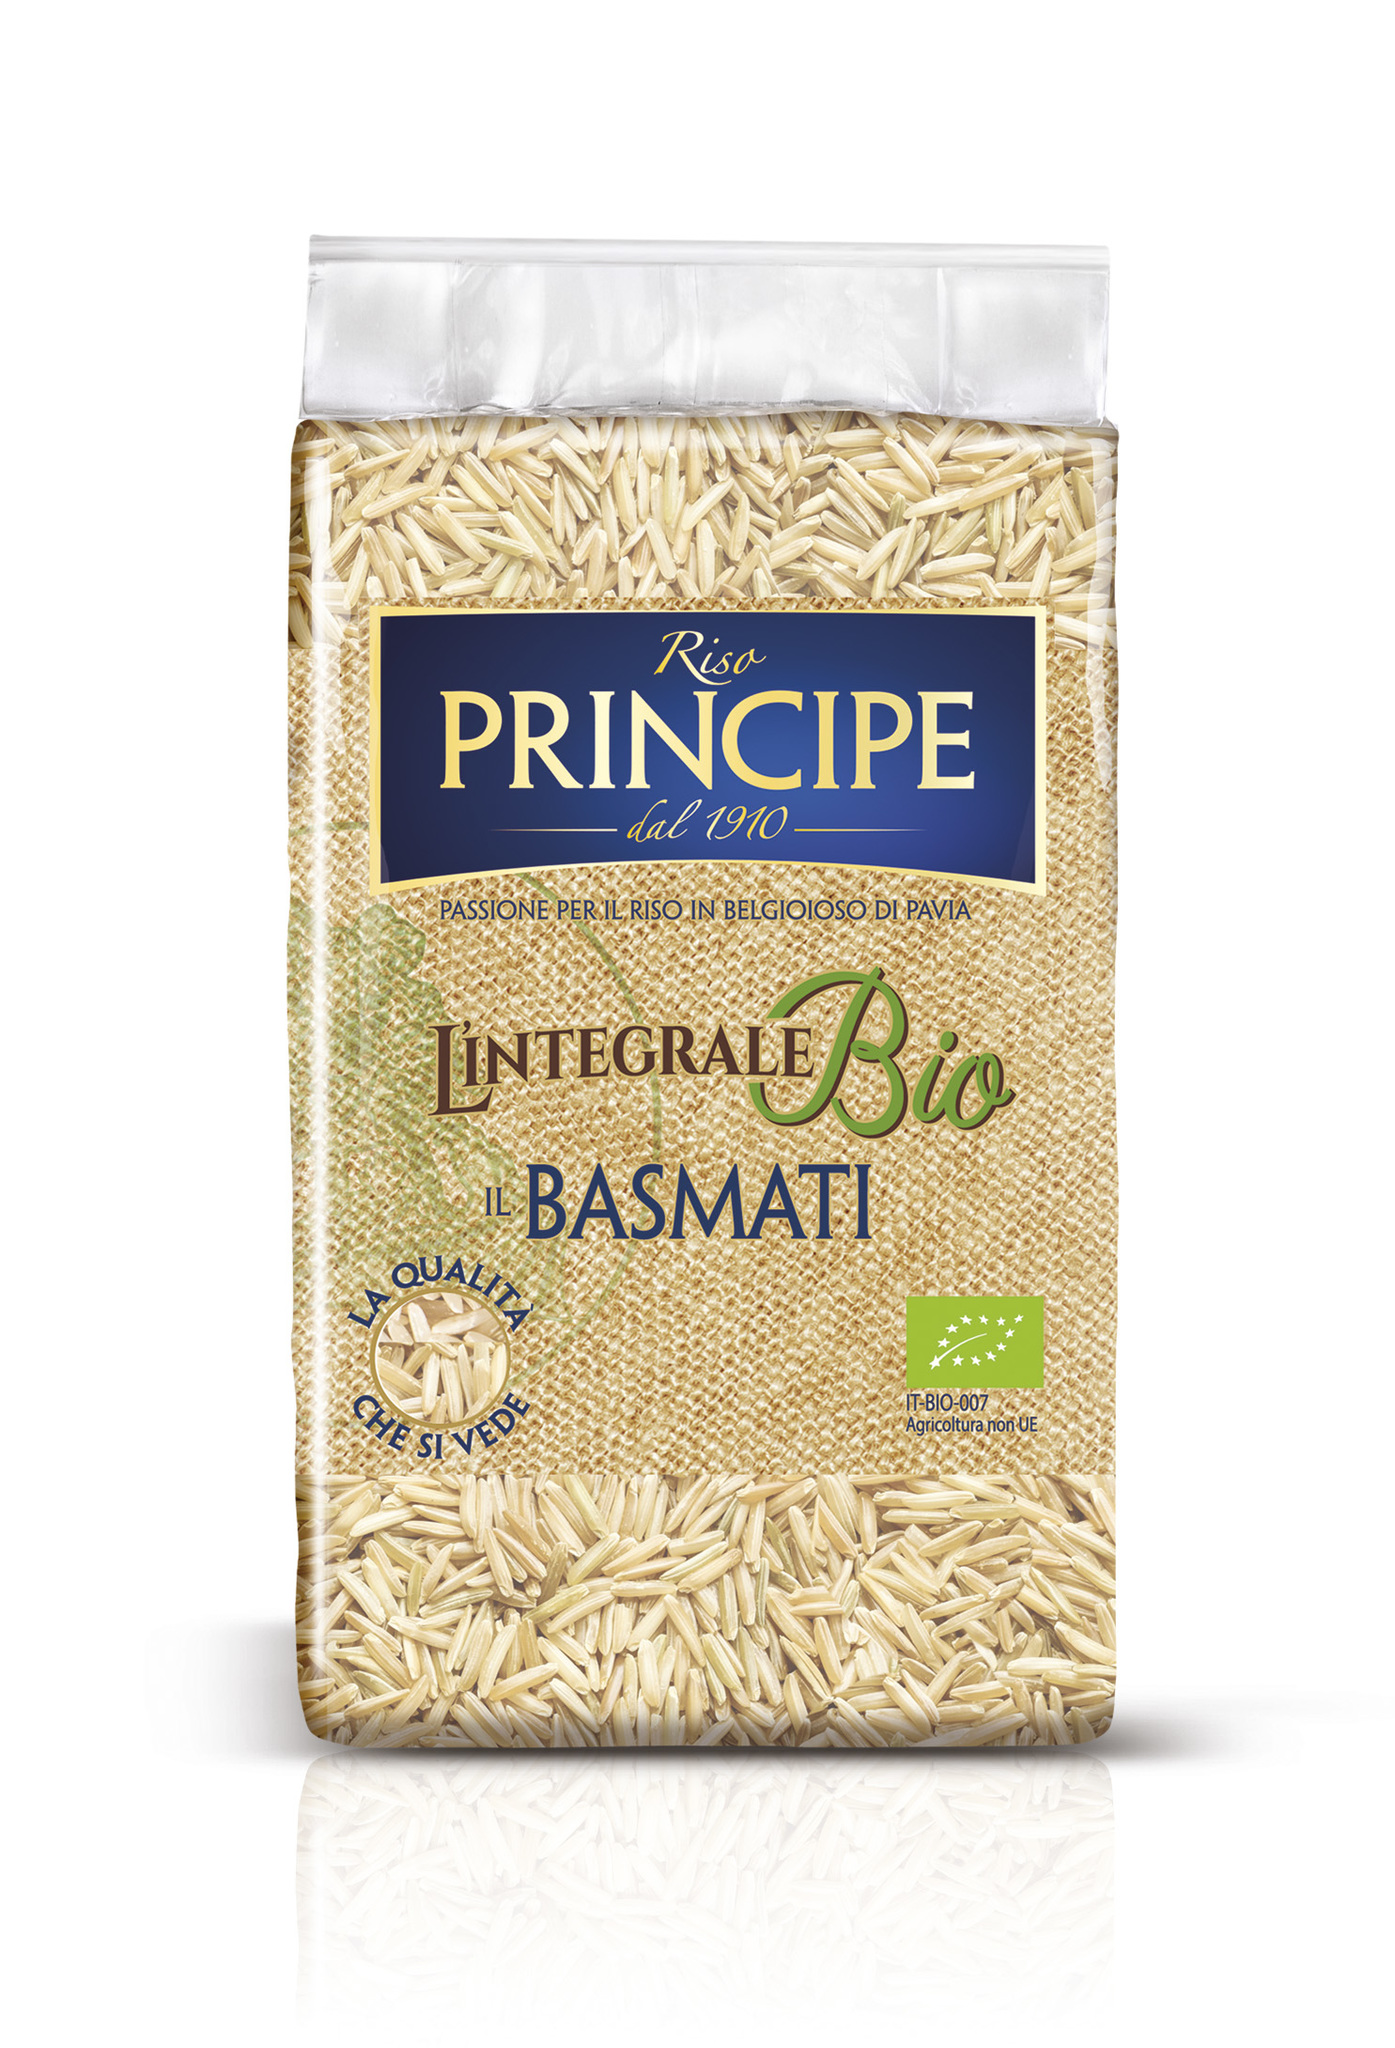 Rice Basmati Riso Principe